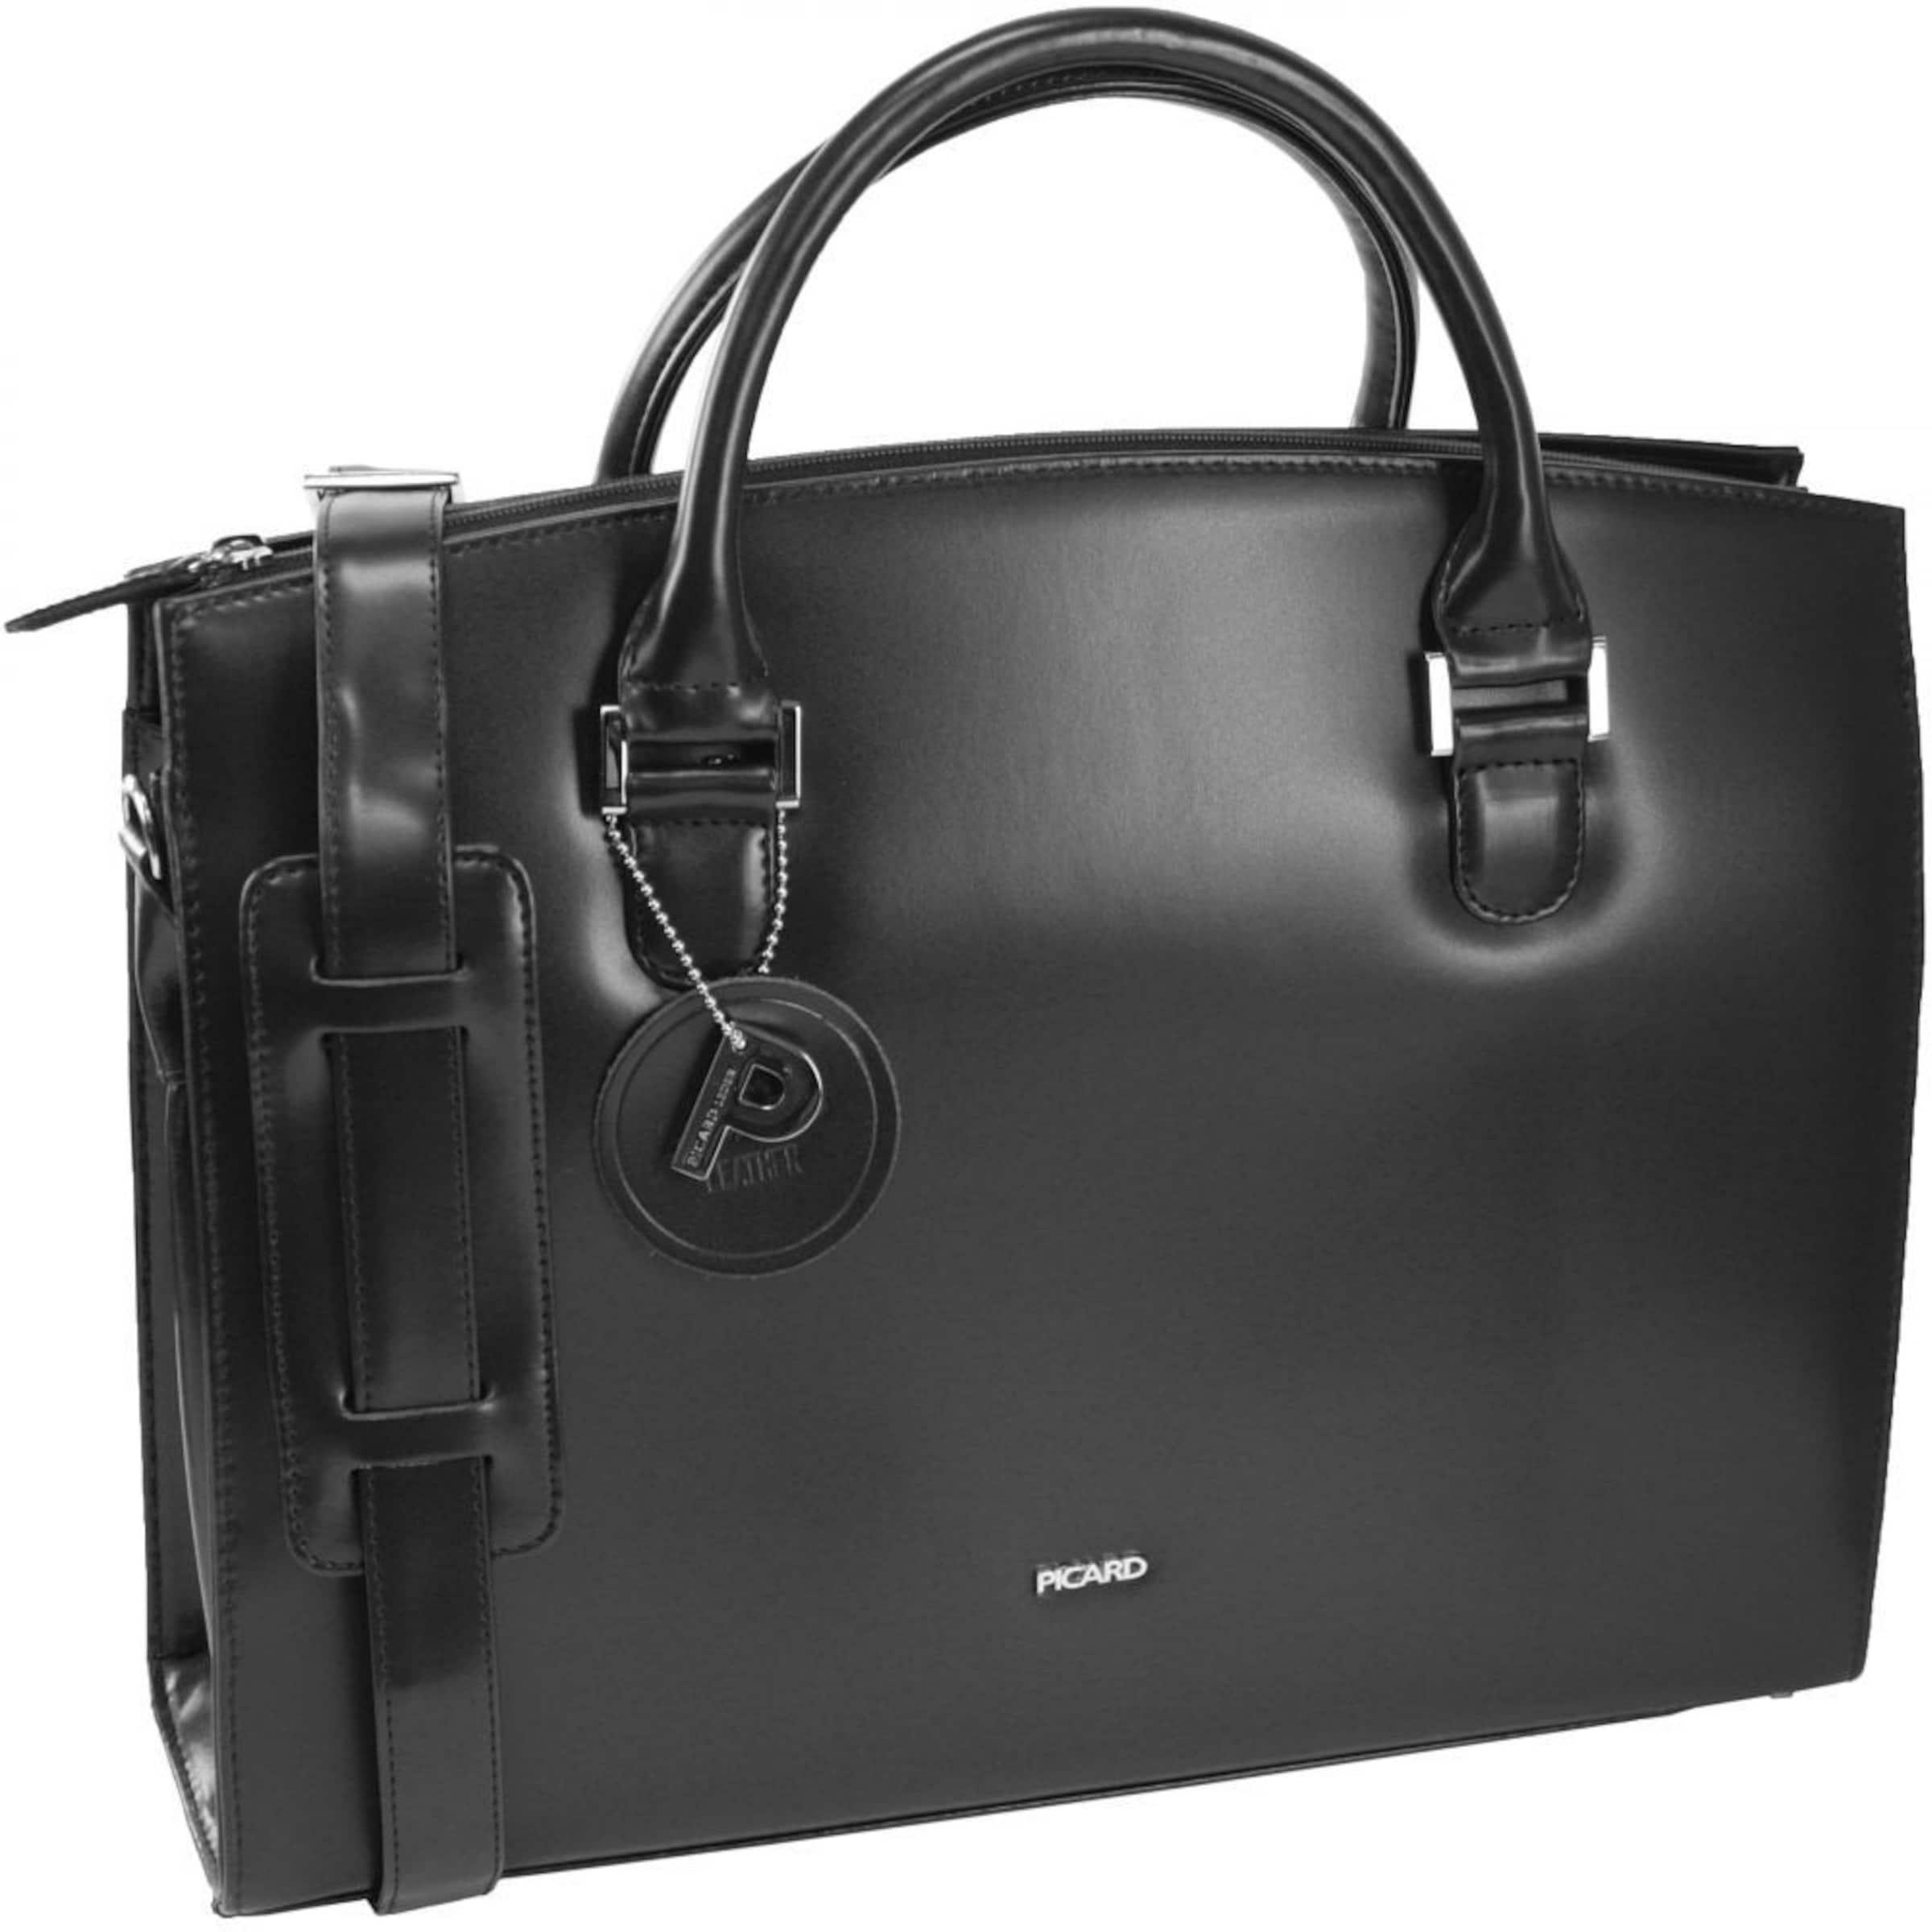 Cm handtasche Schwarz Business Berlin Picard Leder 36 In tsQrdCh